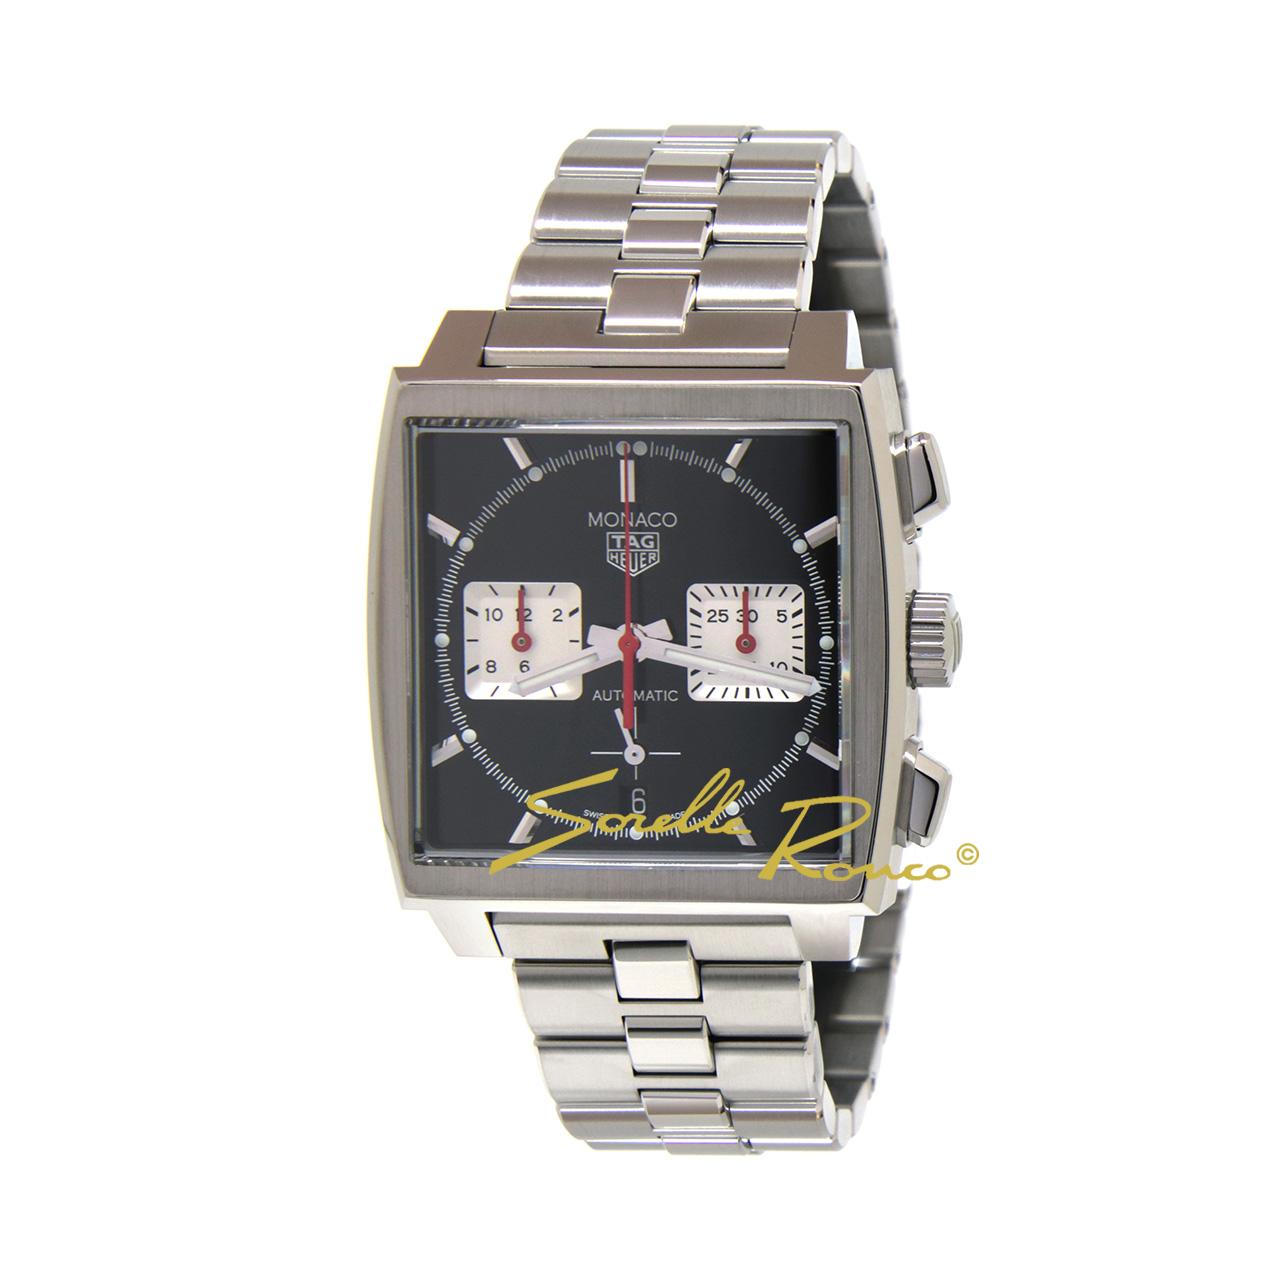 Tag Heuer Monaco Chronograph 39mm Nero Automatico